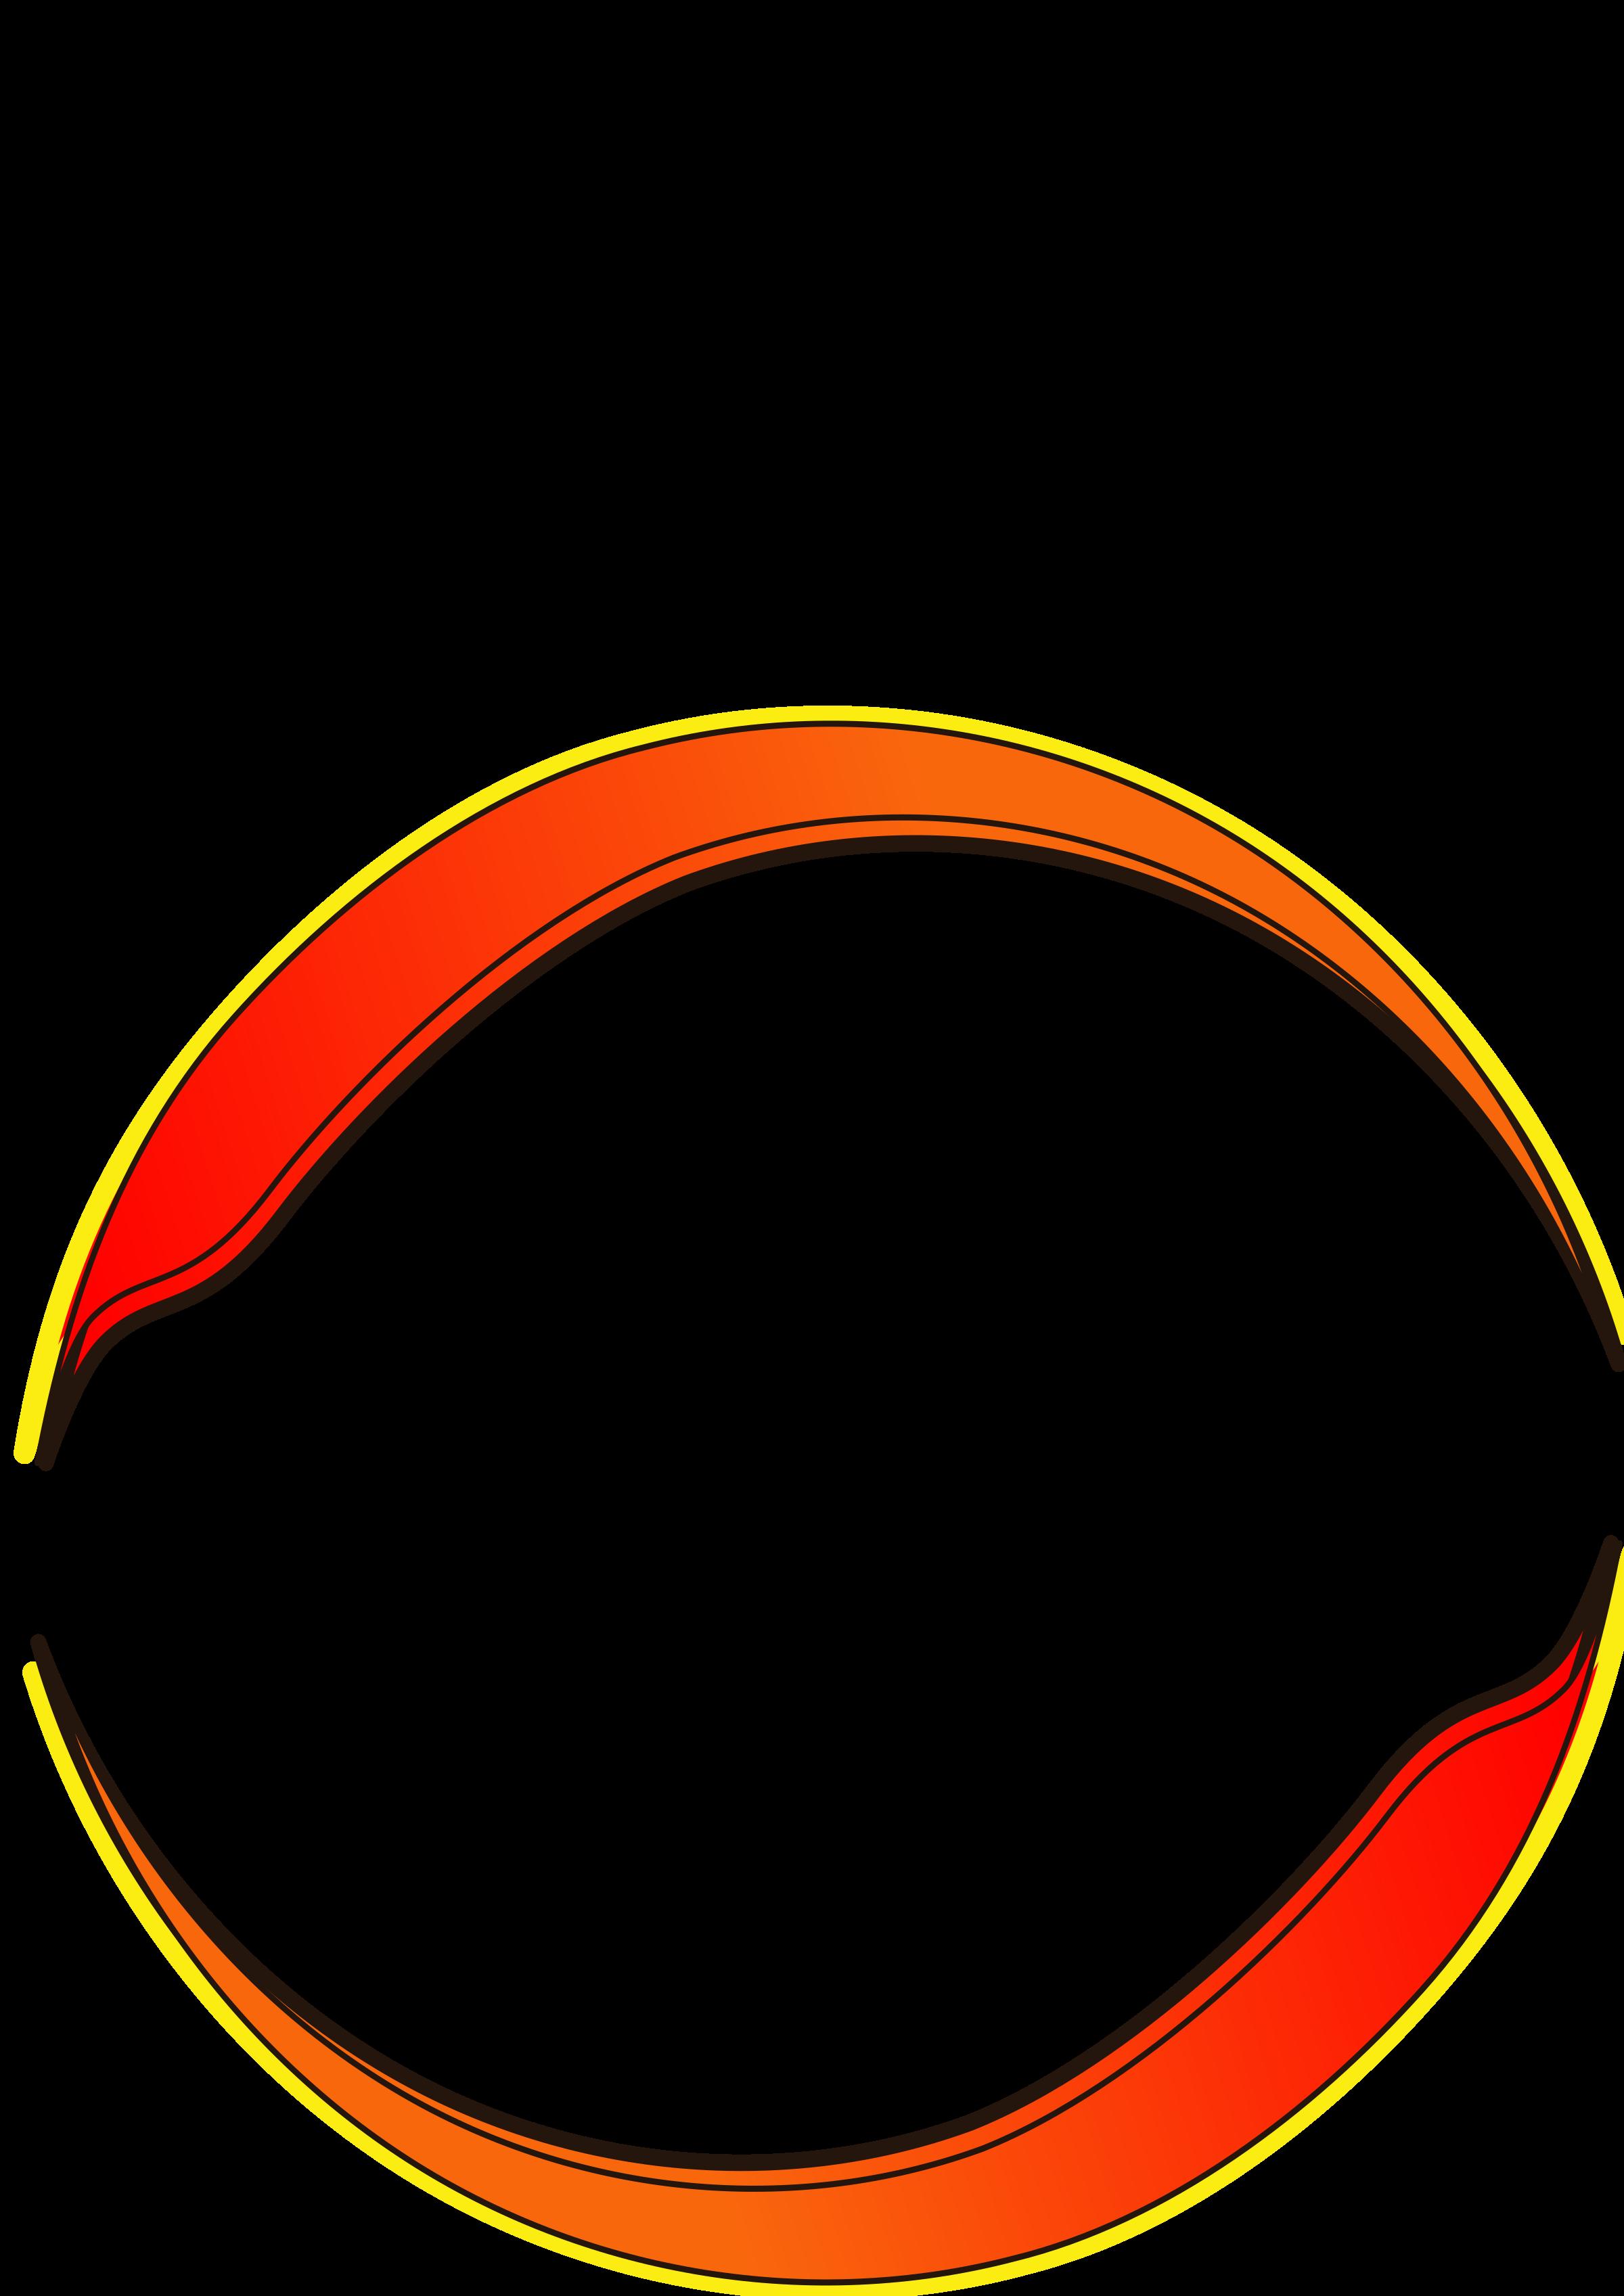 clip transparent Arc big image png. Logo clipart